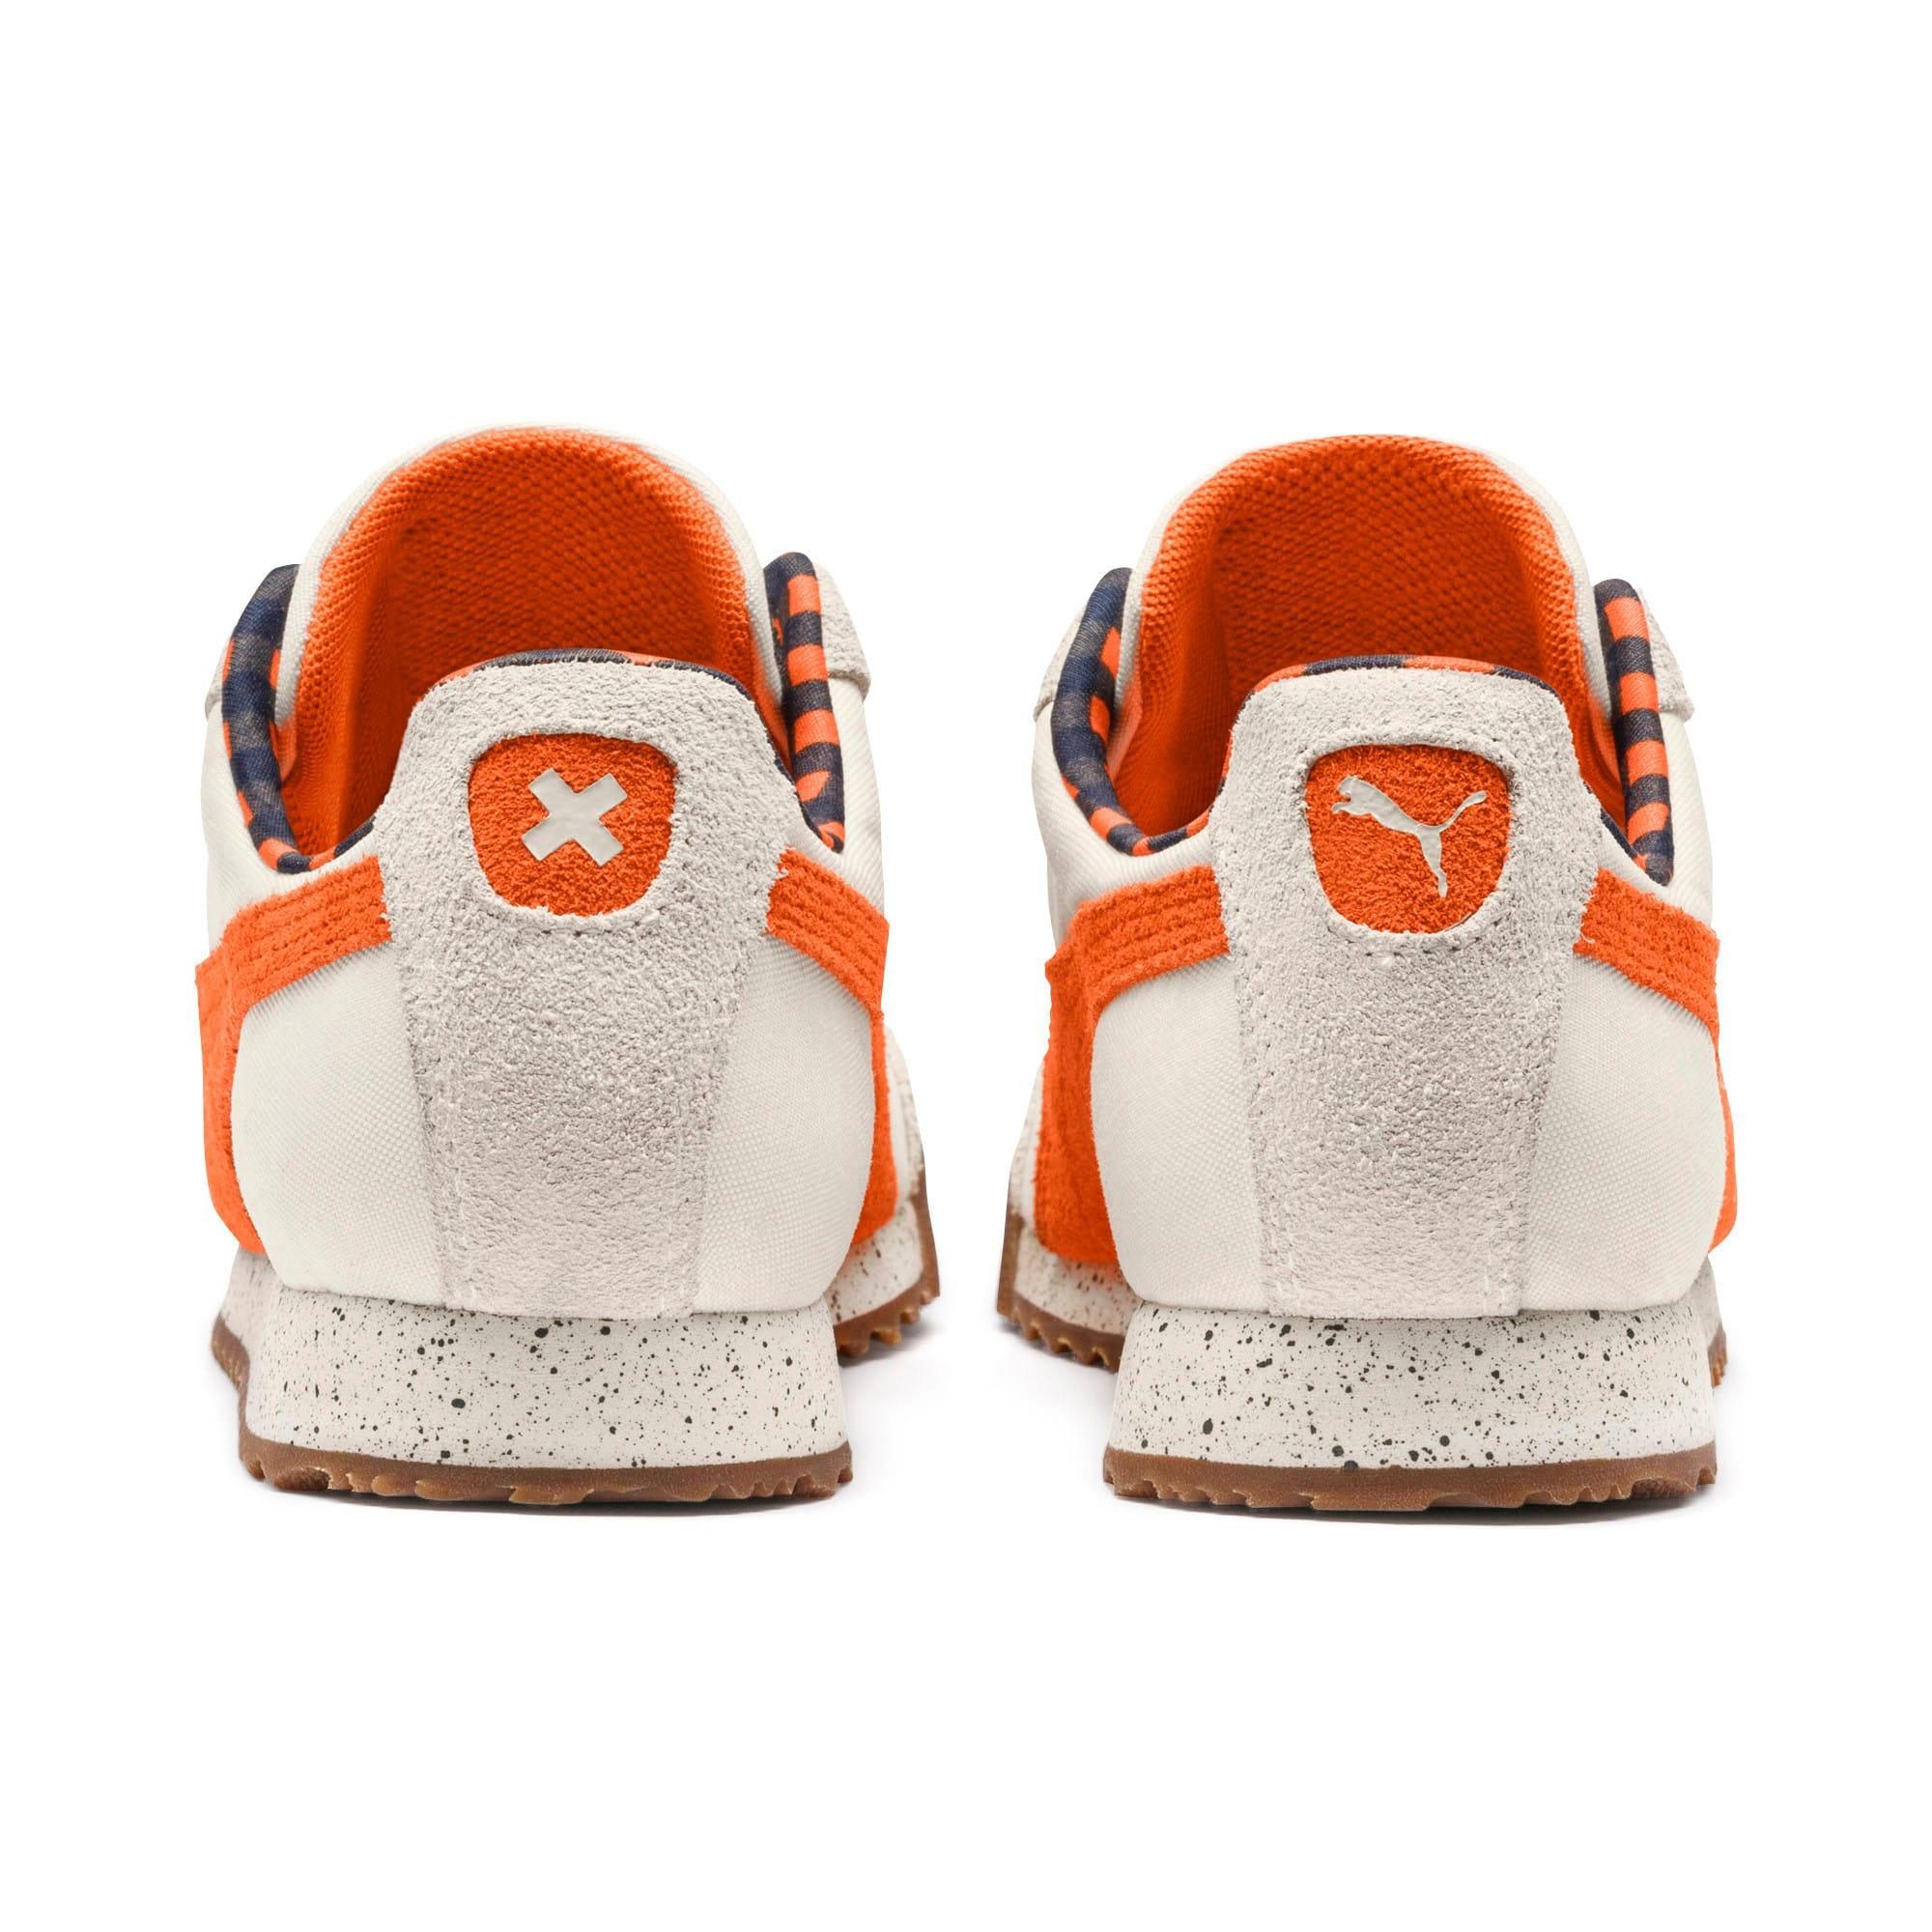 Thumbnail 4 of PUMA X TINYCOTTONS Roma Sneakers JR, White Asparagus-Orange-Blue, medium